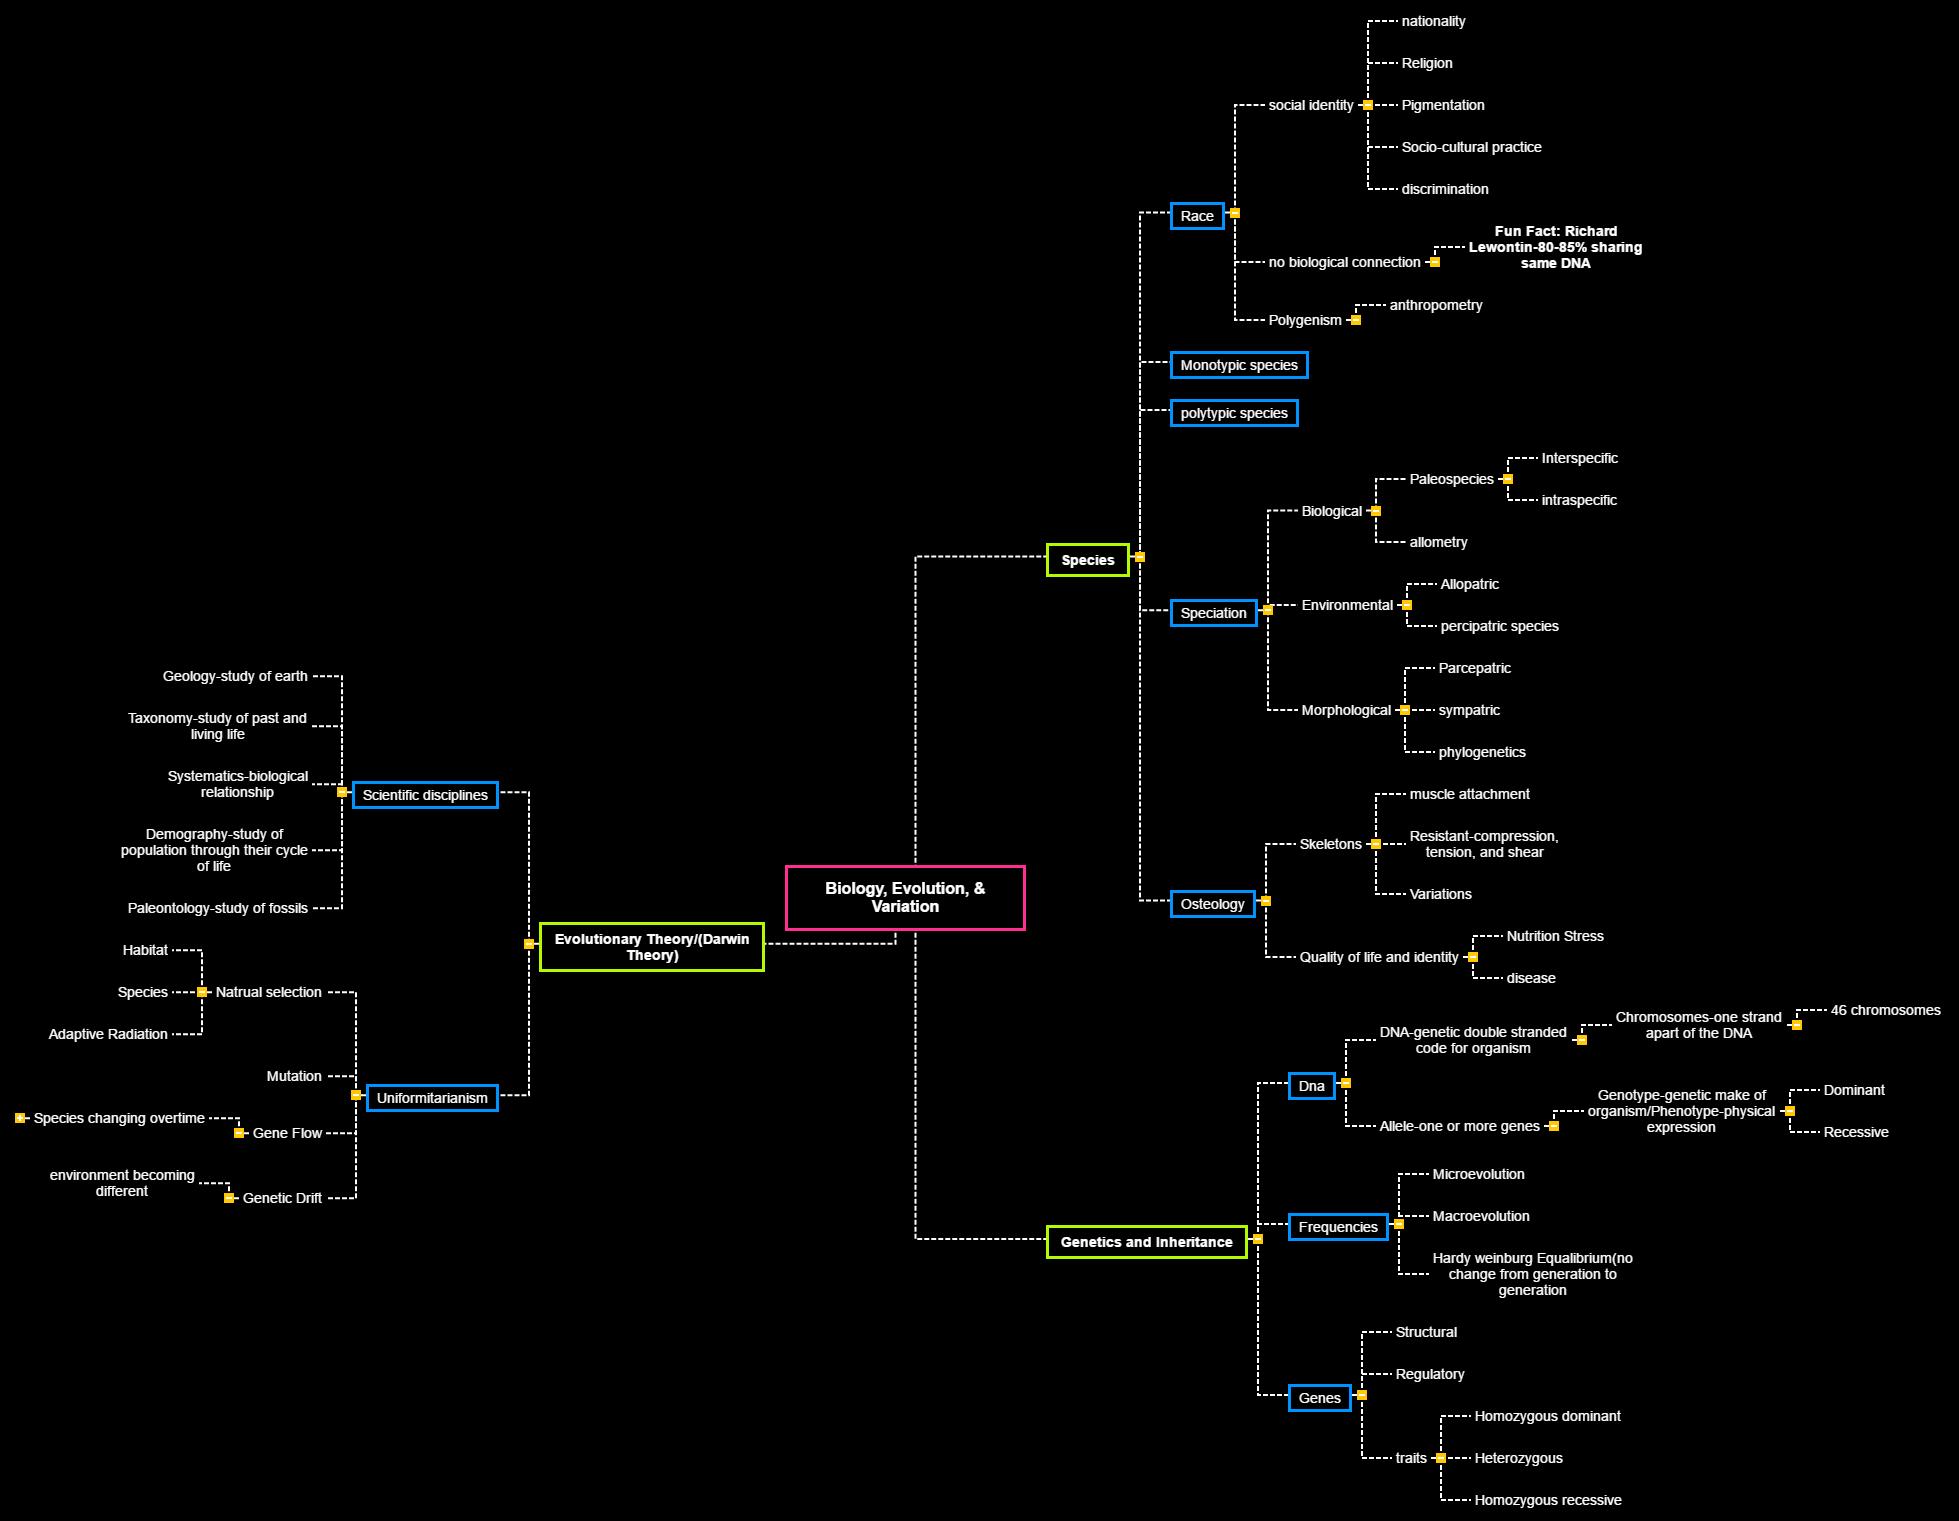 JuJuan's Davis(davis.5883) Biology, Evolution, & Variation Mind Map